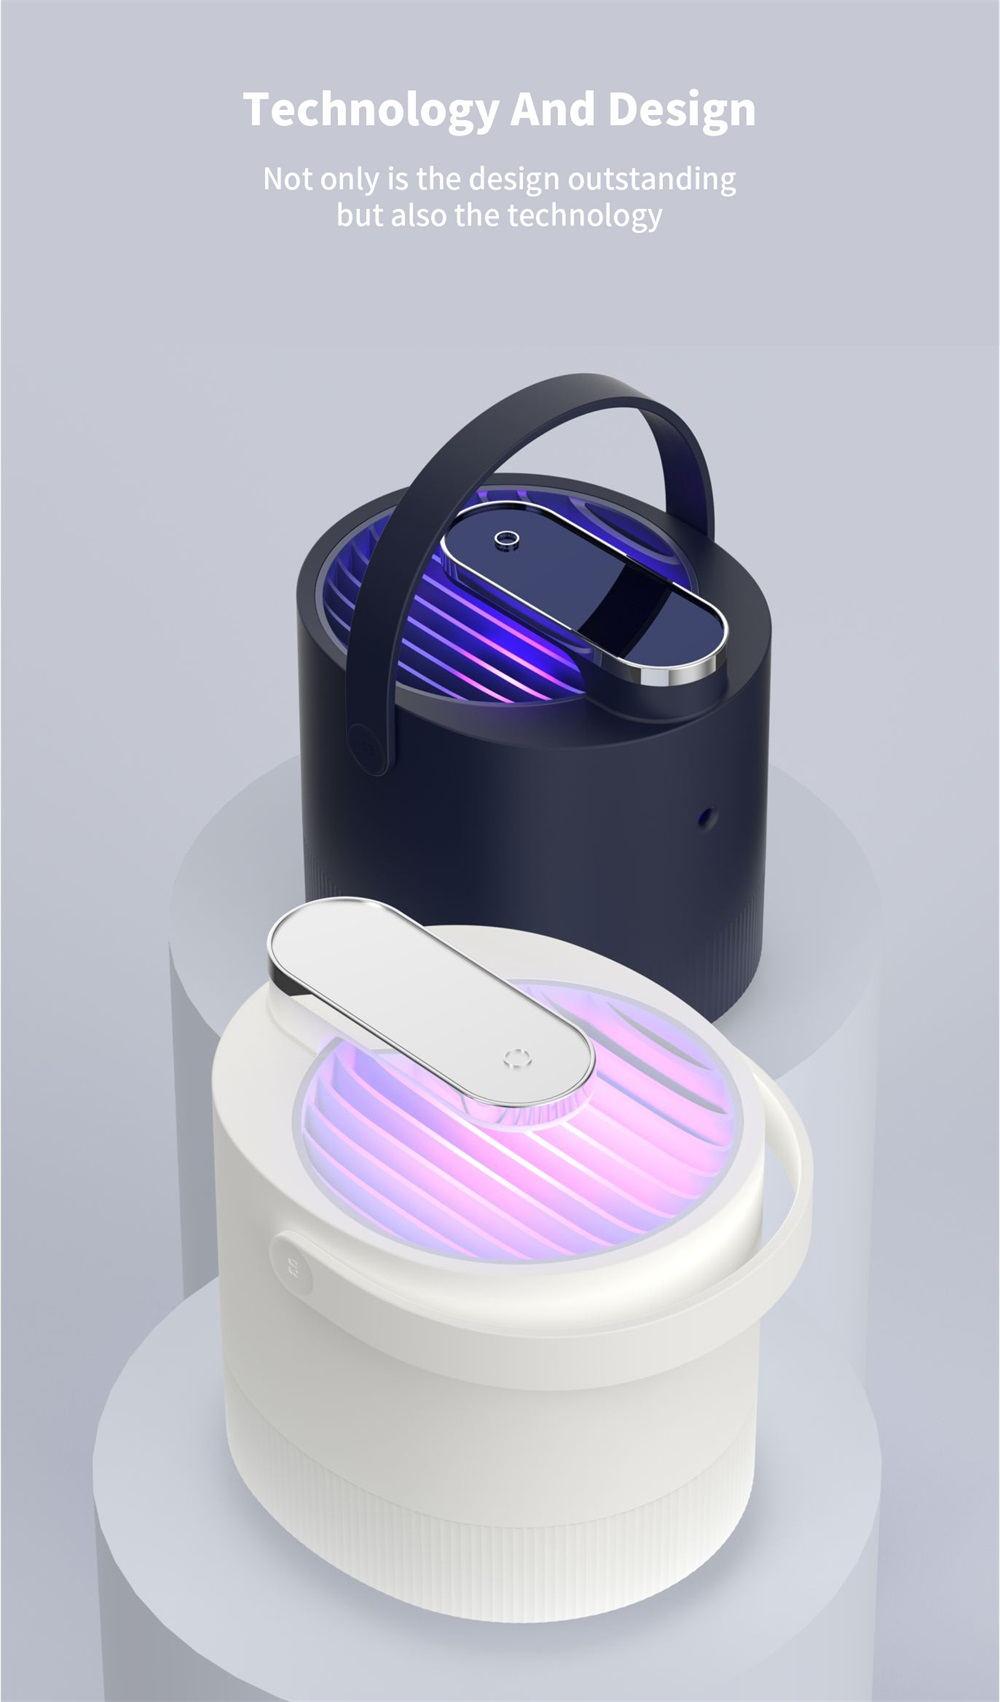 new xiaomi vh-328 mosquito killer lamp